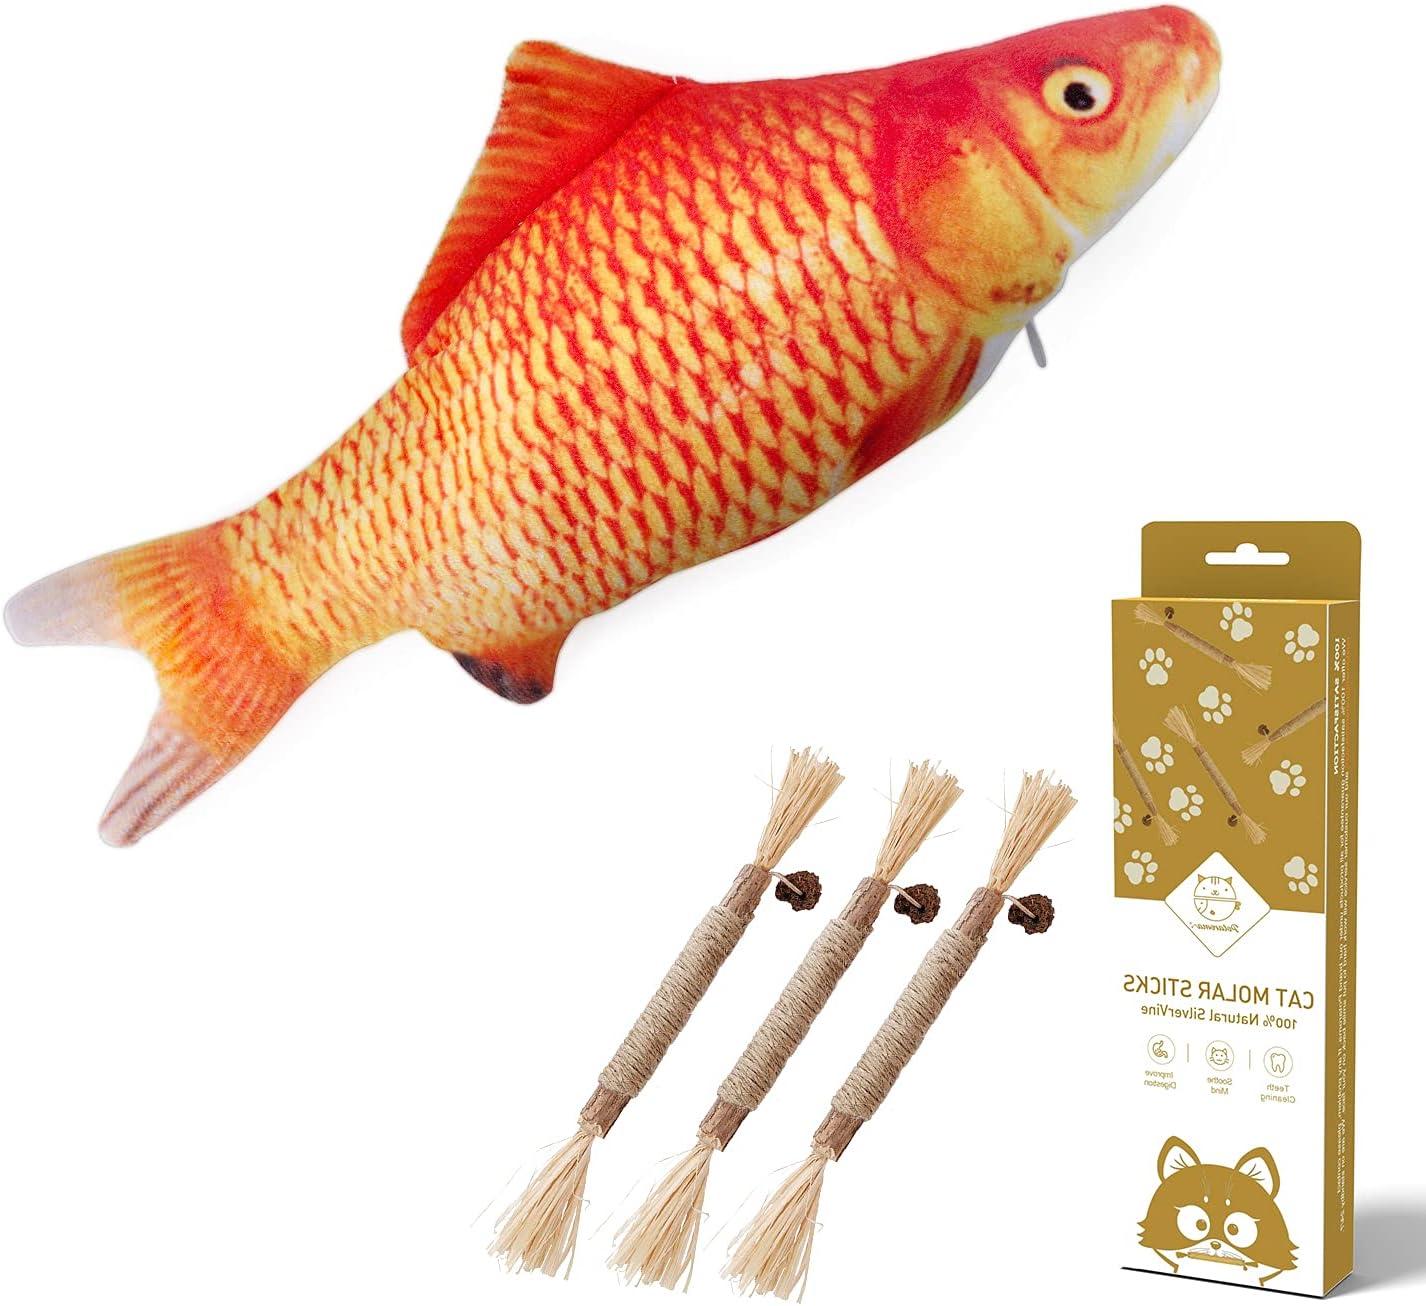 New Free Shipping Potaroma Sale Flopping Fish Cat Dog Molar Toy Sticks 3Pcs and